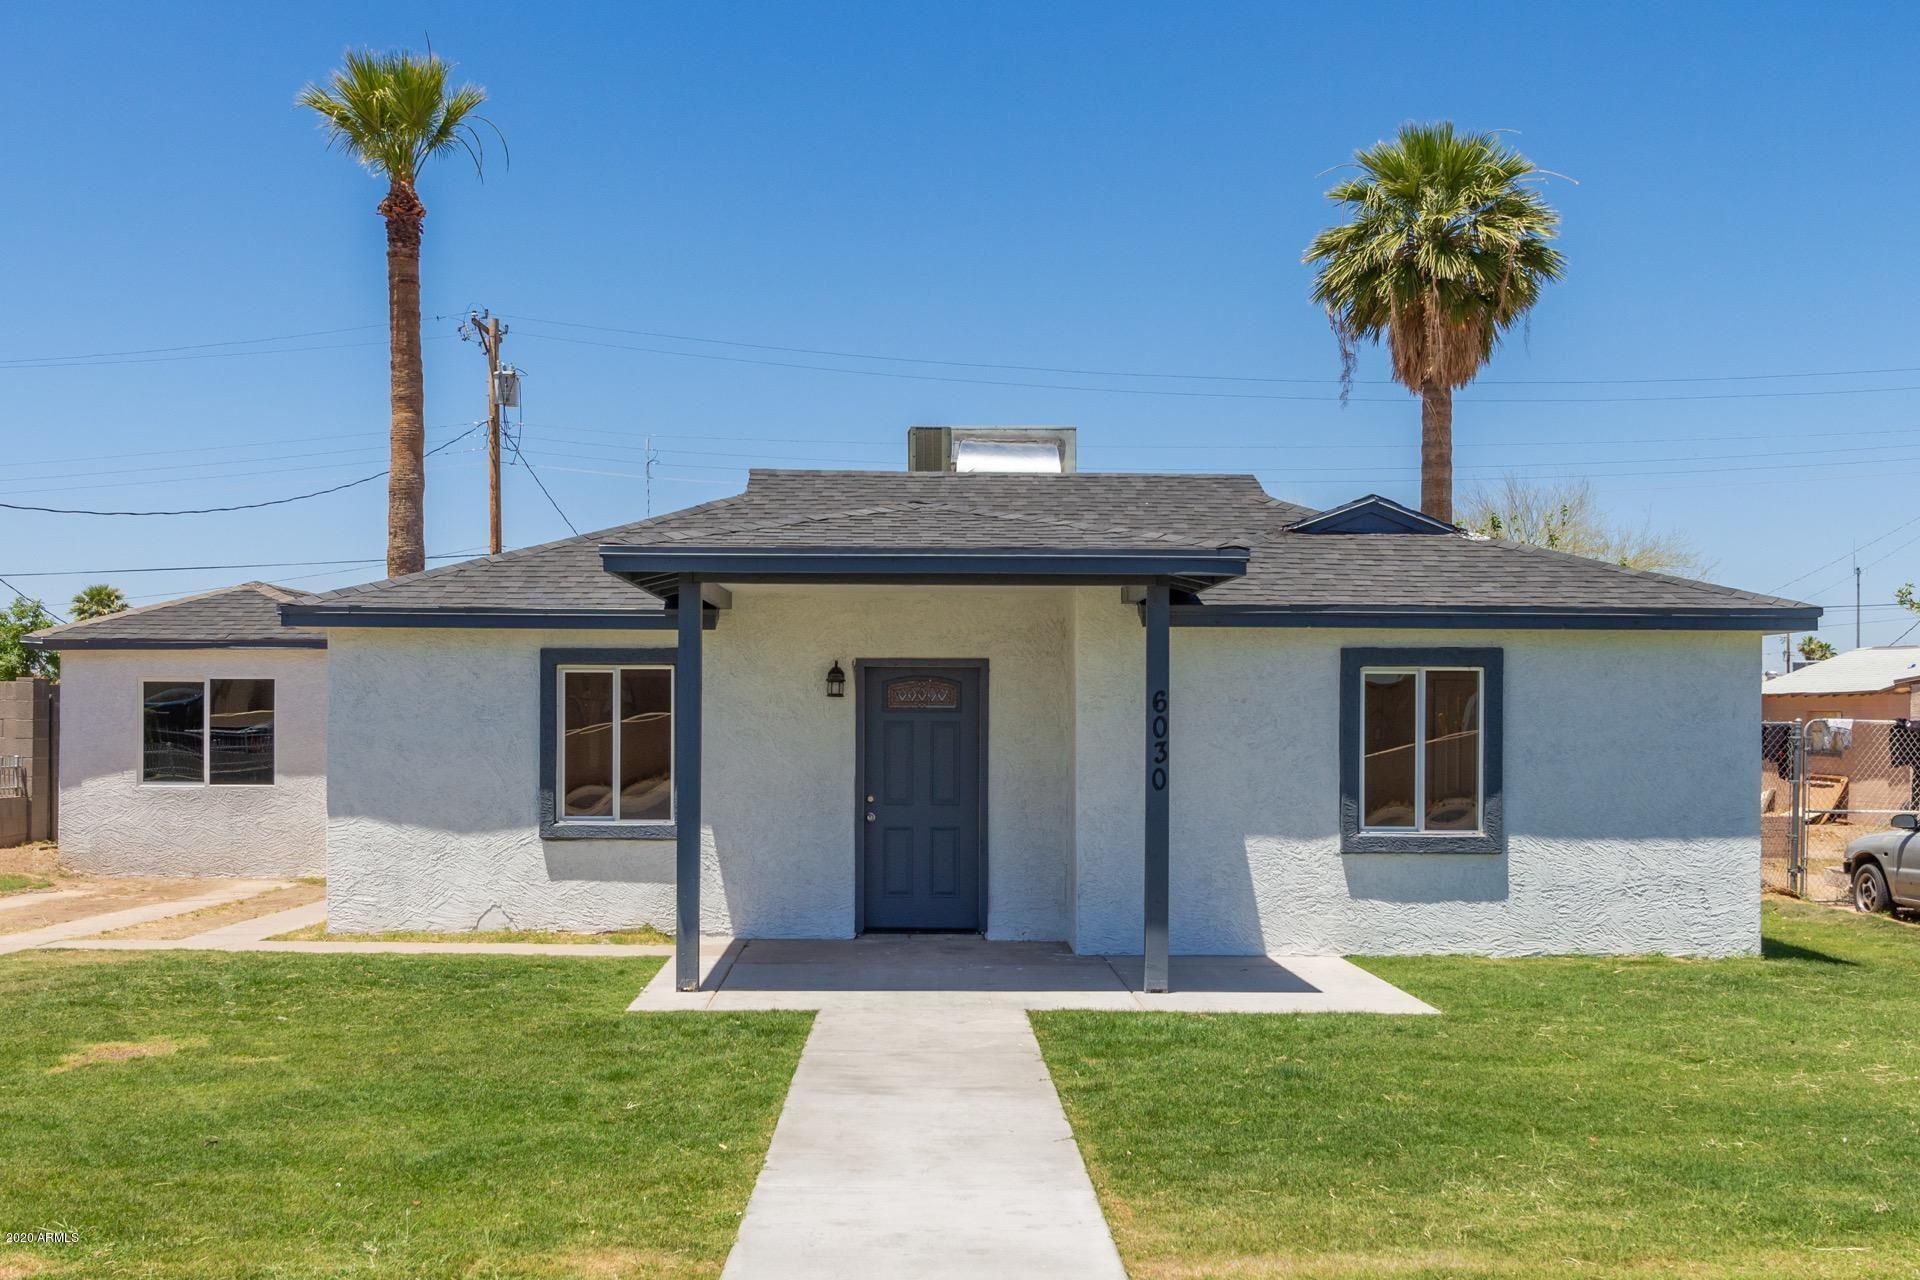 Property Image Of 6030 S 2Nd Avenue In Phoenix, Az